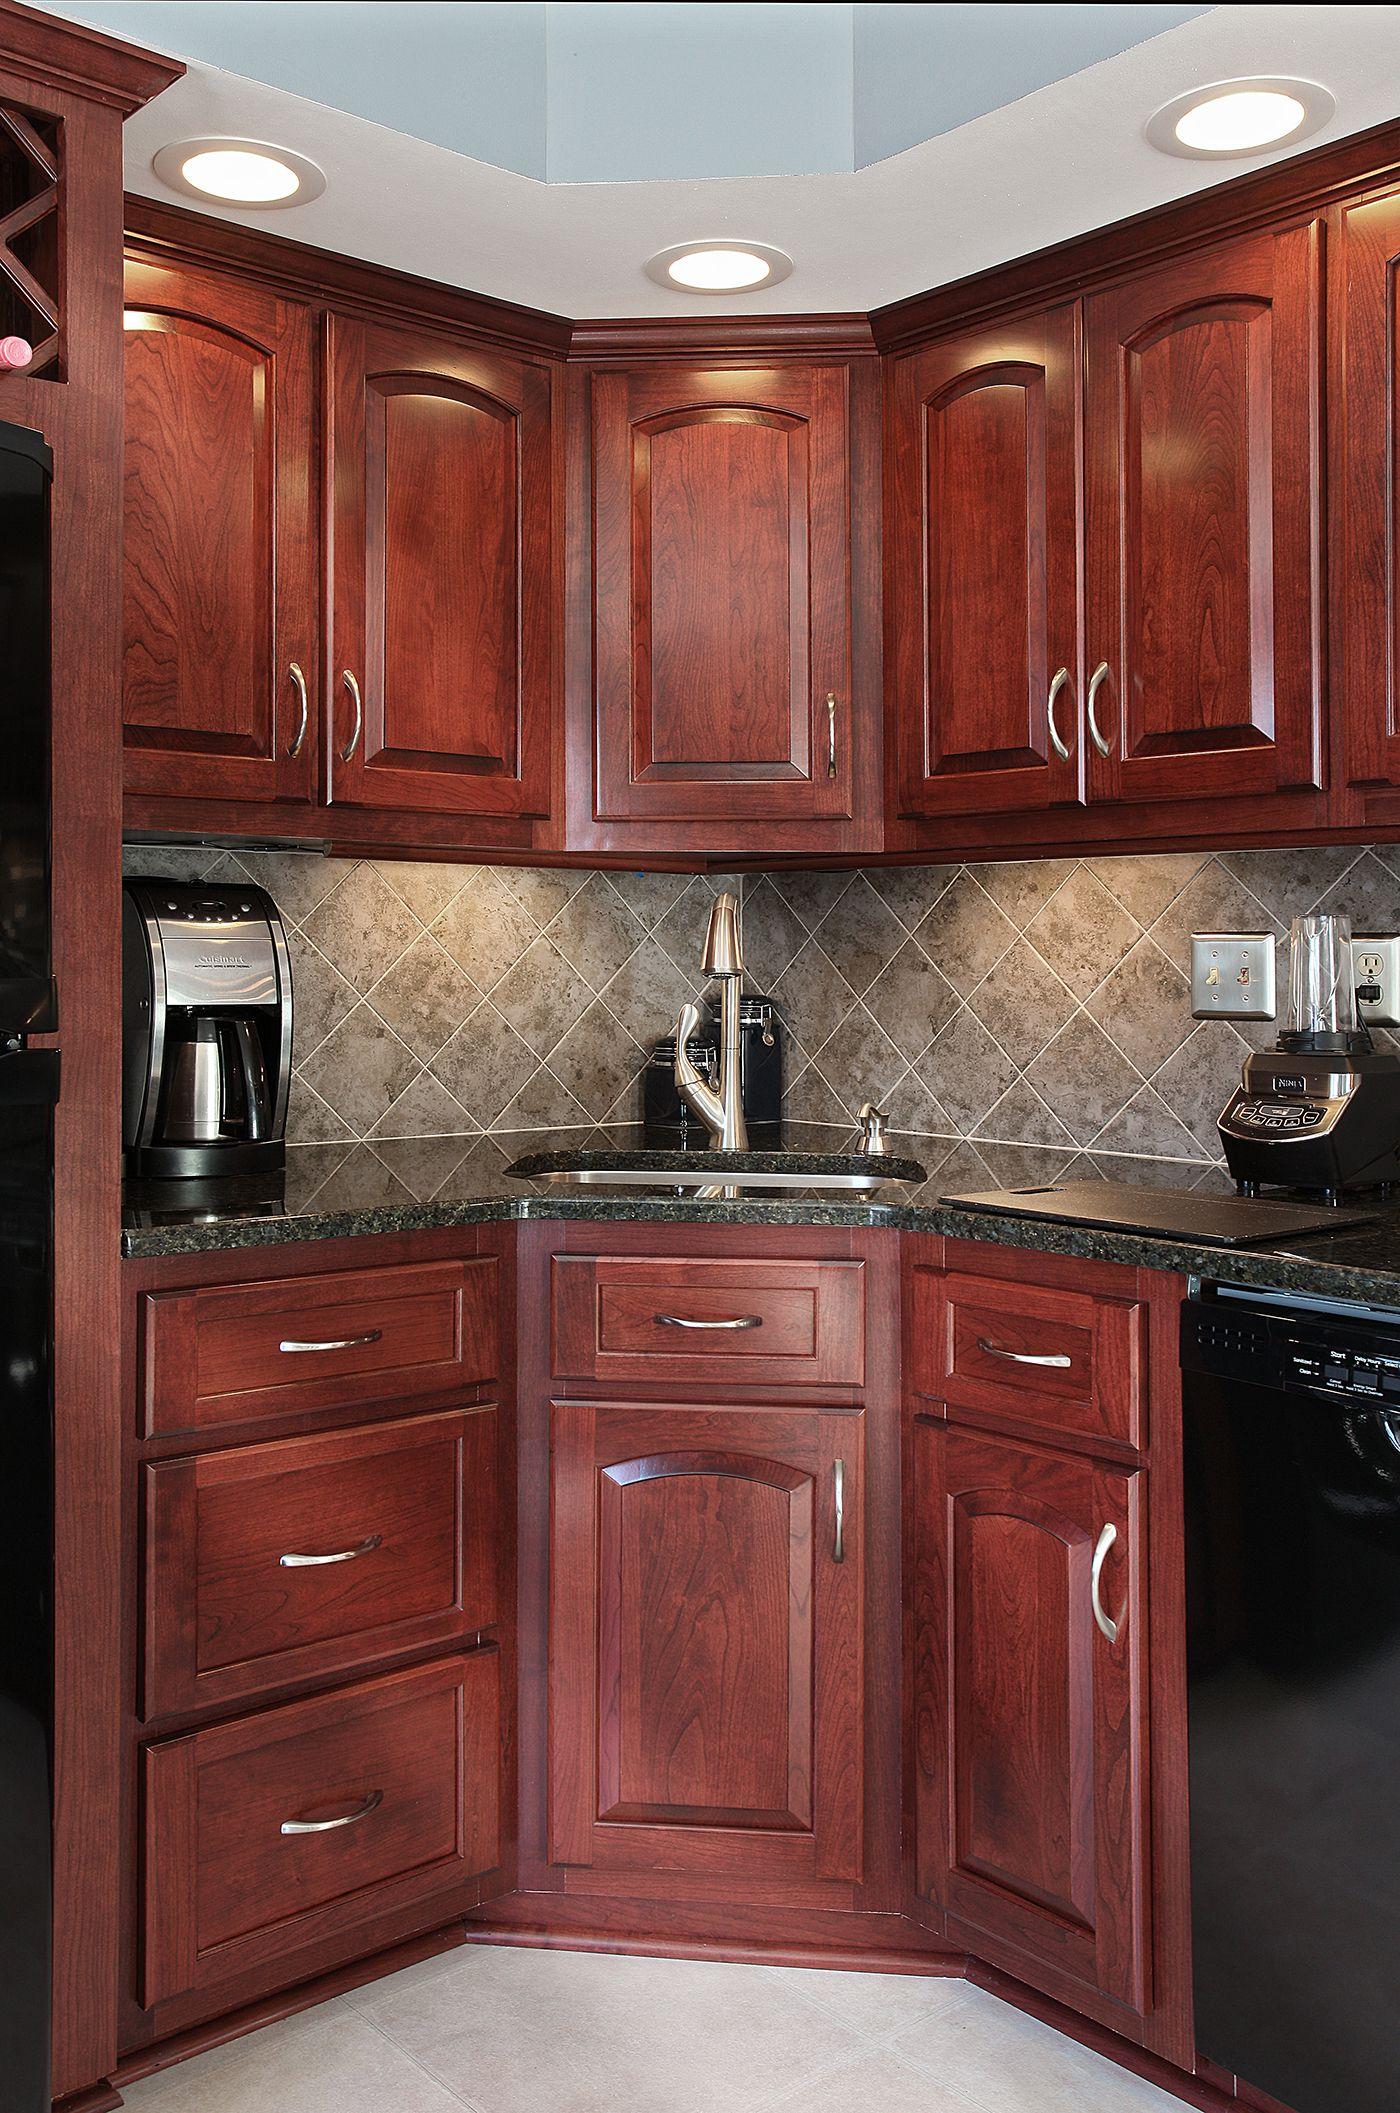 Cherry Cordovan Cabinet Refacing Cherry Cabinets Kitchen Kitchen Renovation Kitchen Remodel